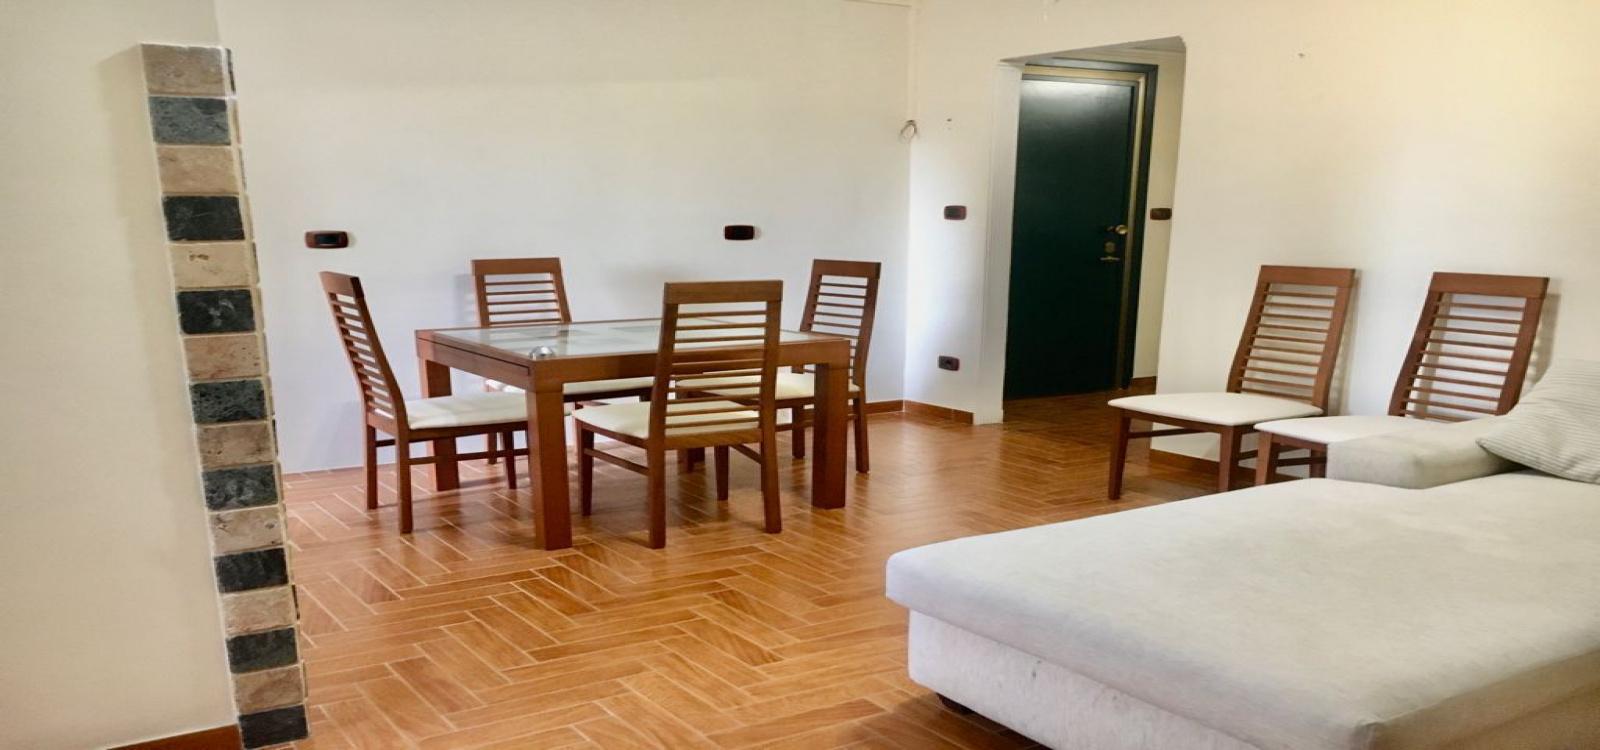 viale santa panagia,siracusa,96100,Appartamento,viale santa panagia,2435